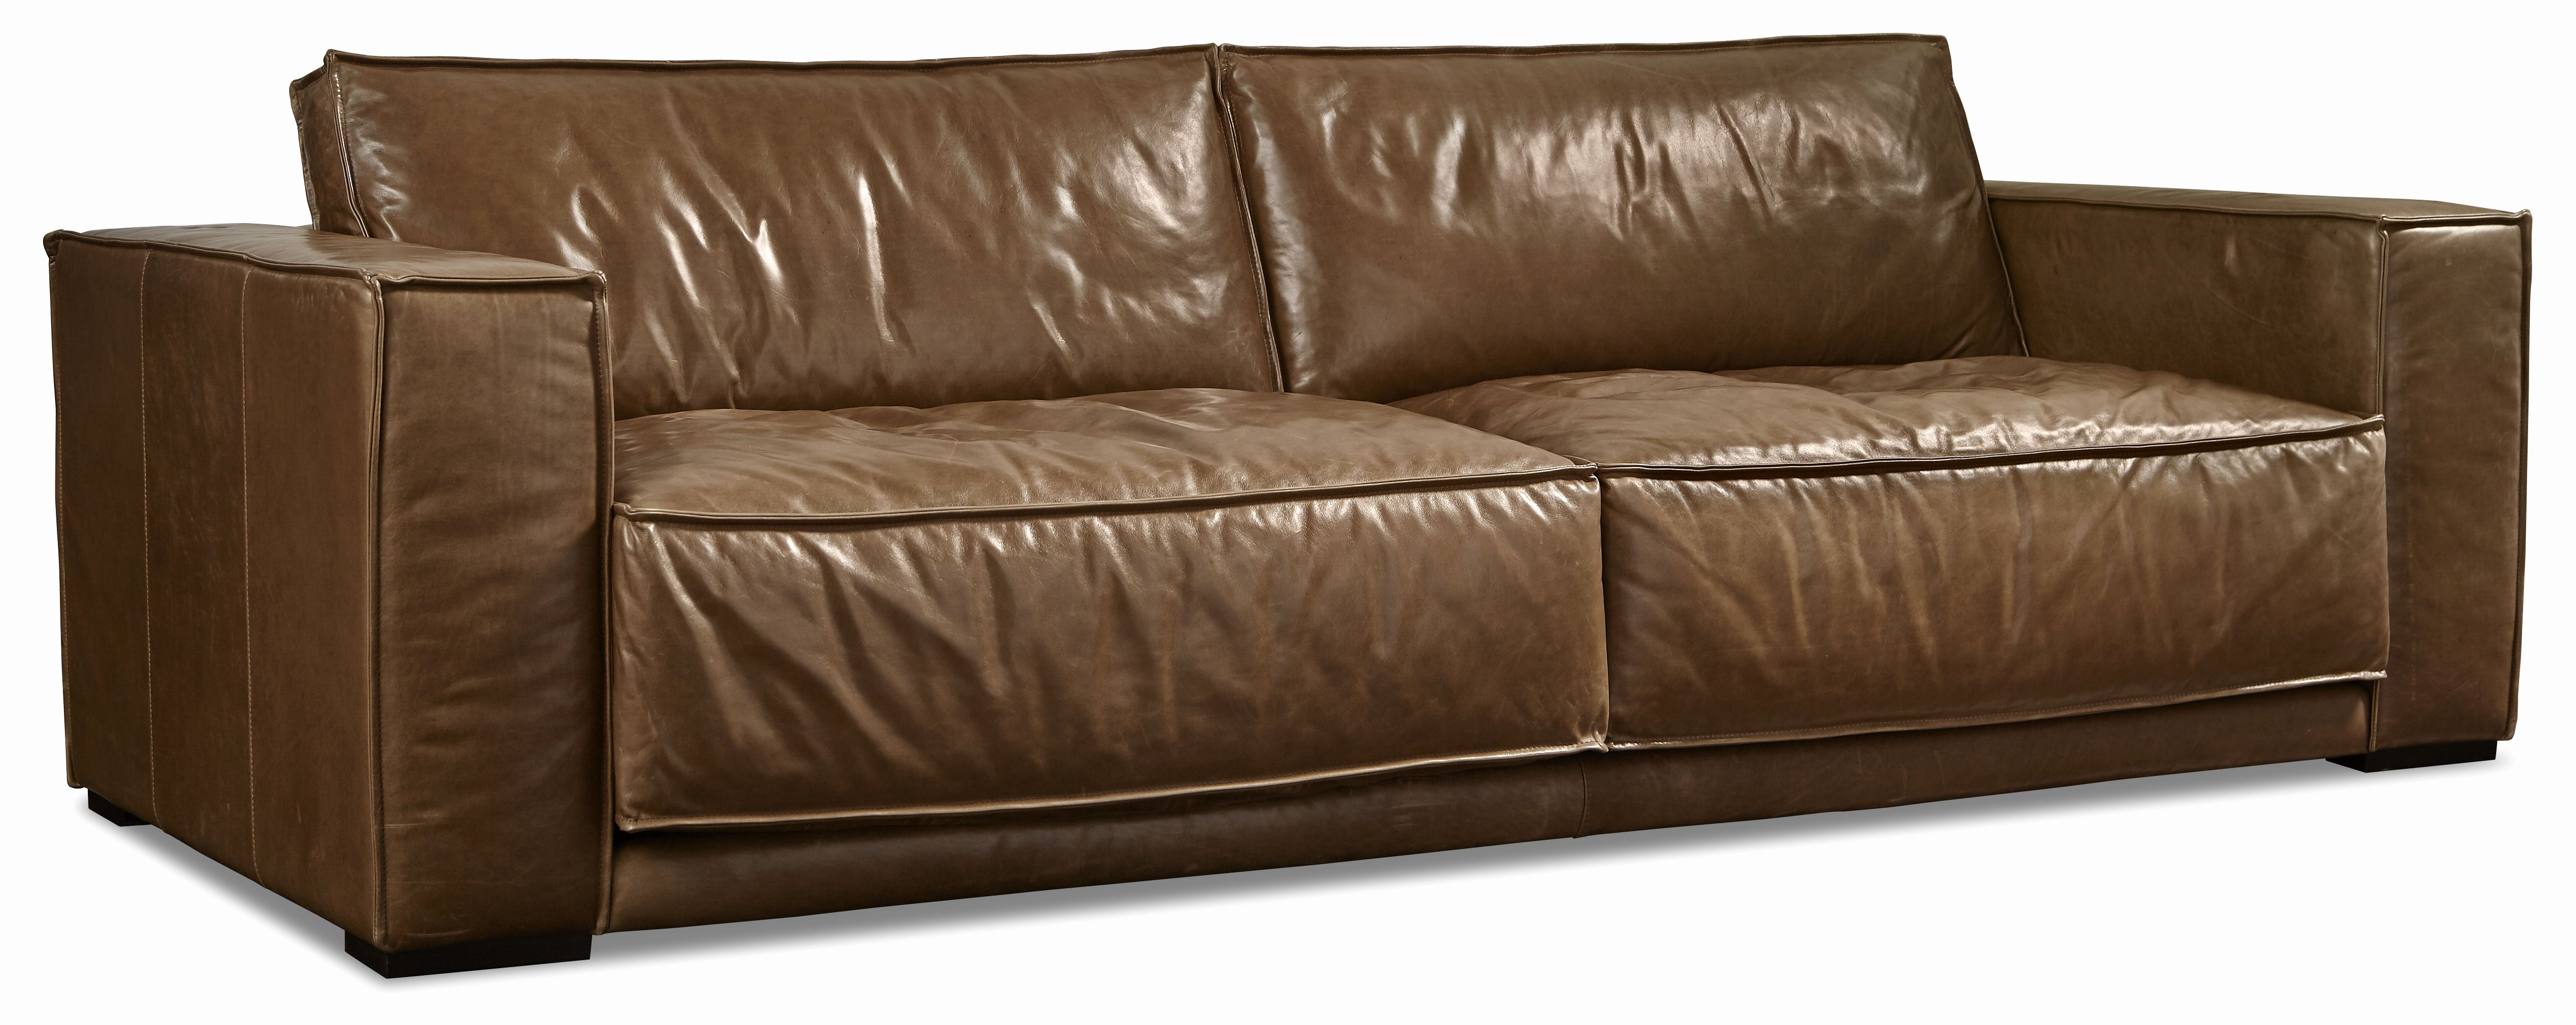 Elegant American Leather sofa Bed Prices Pics American